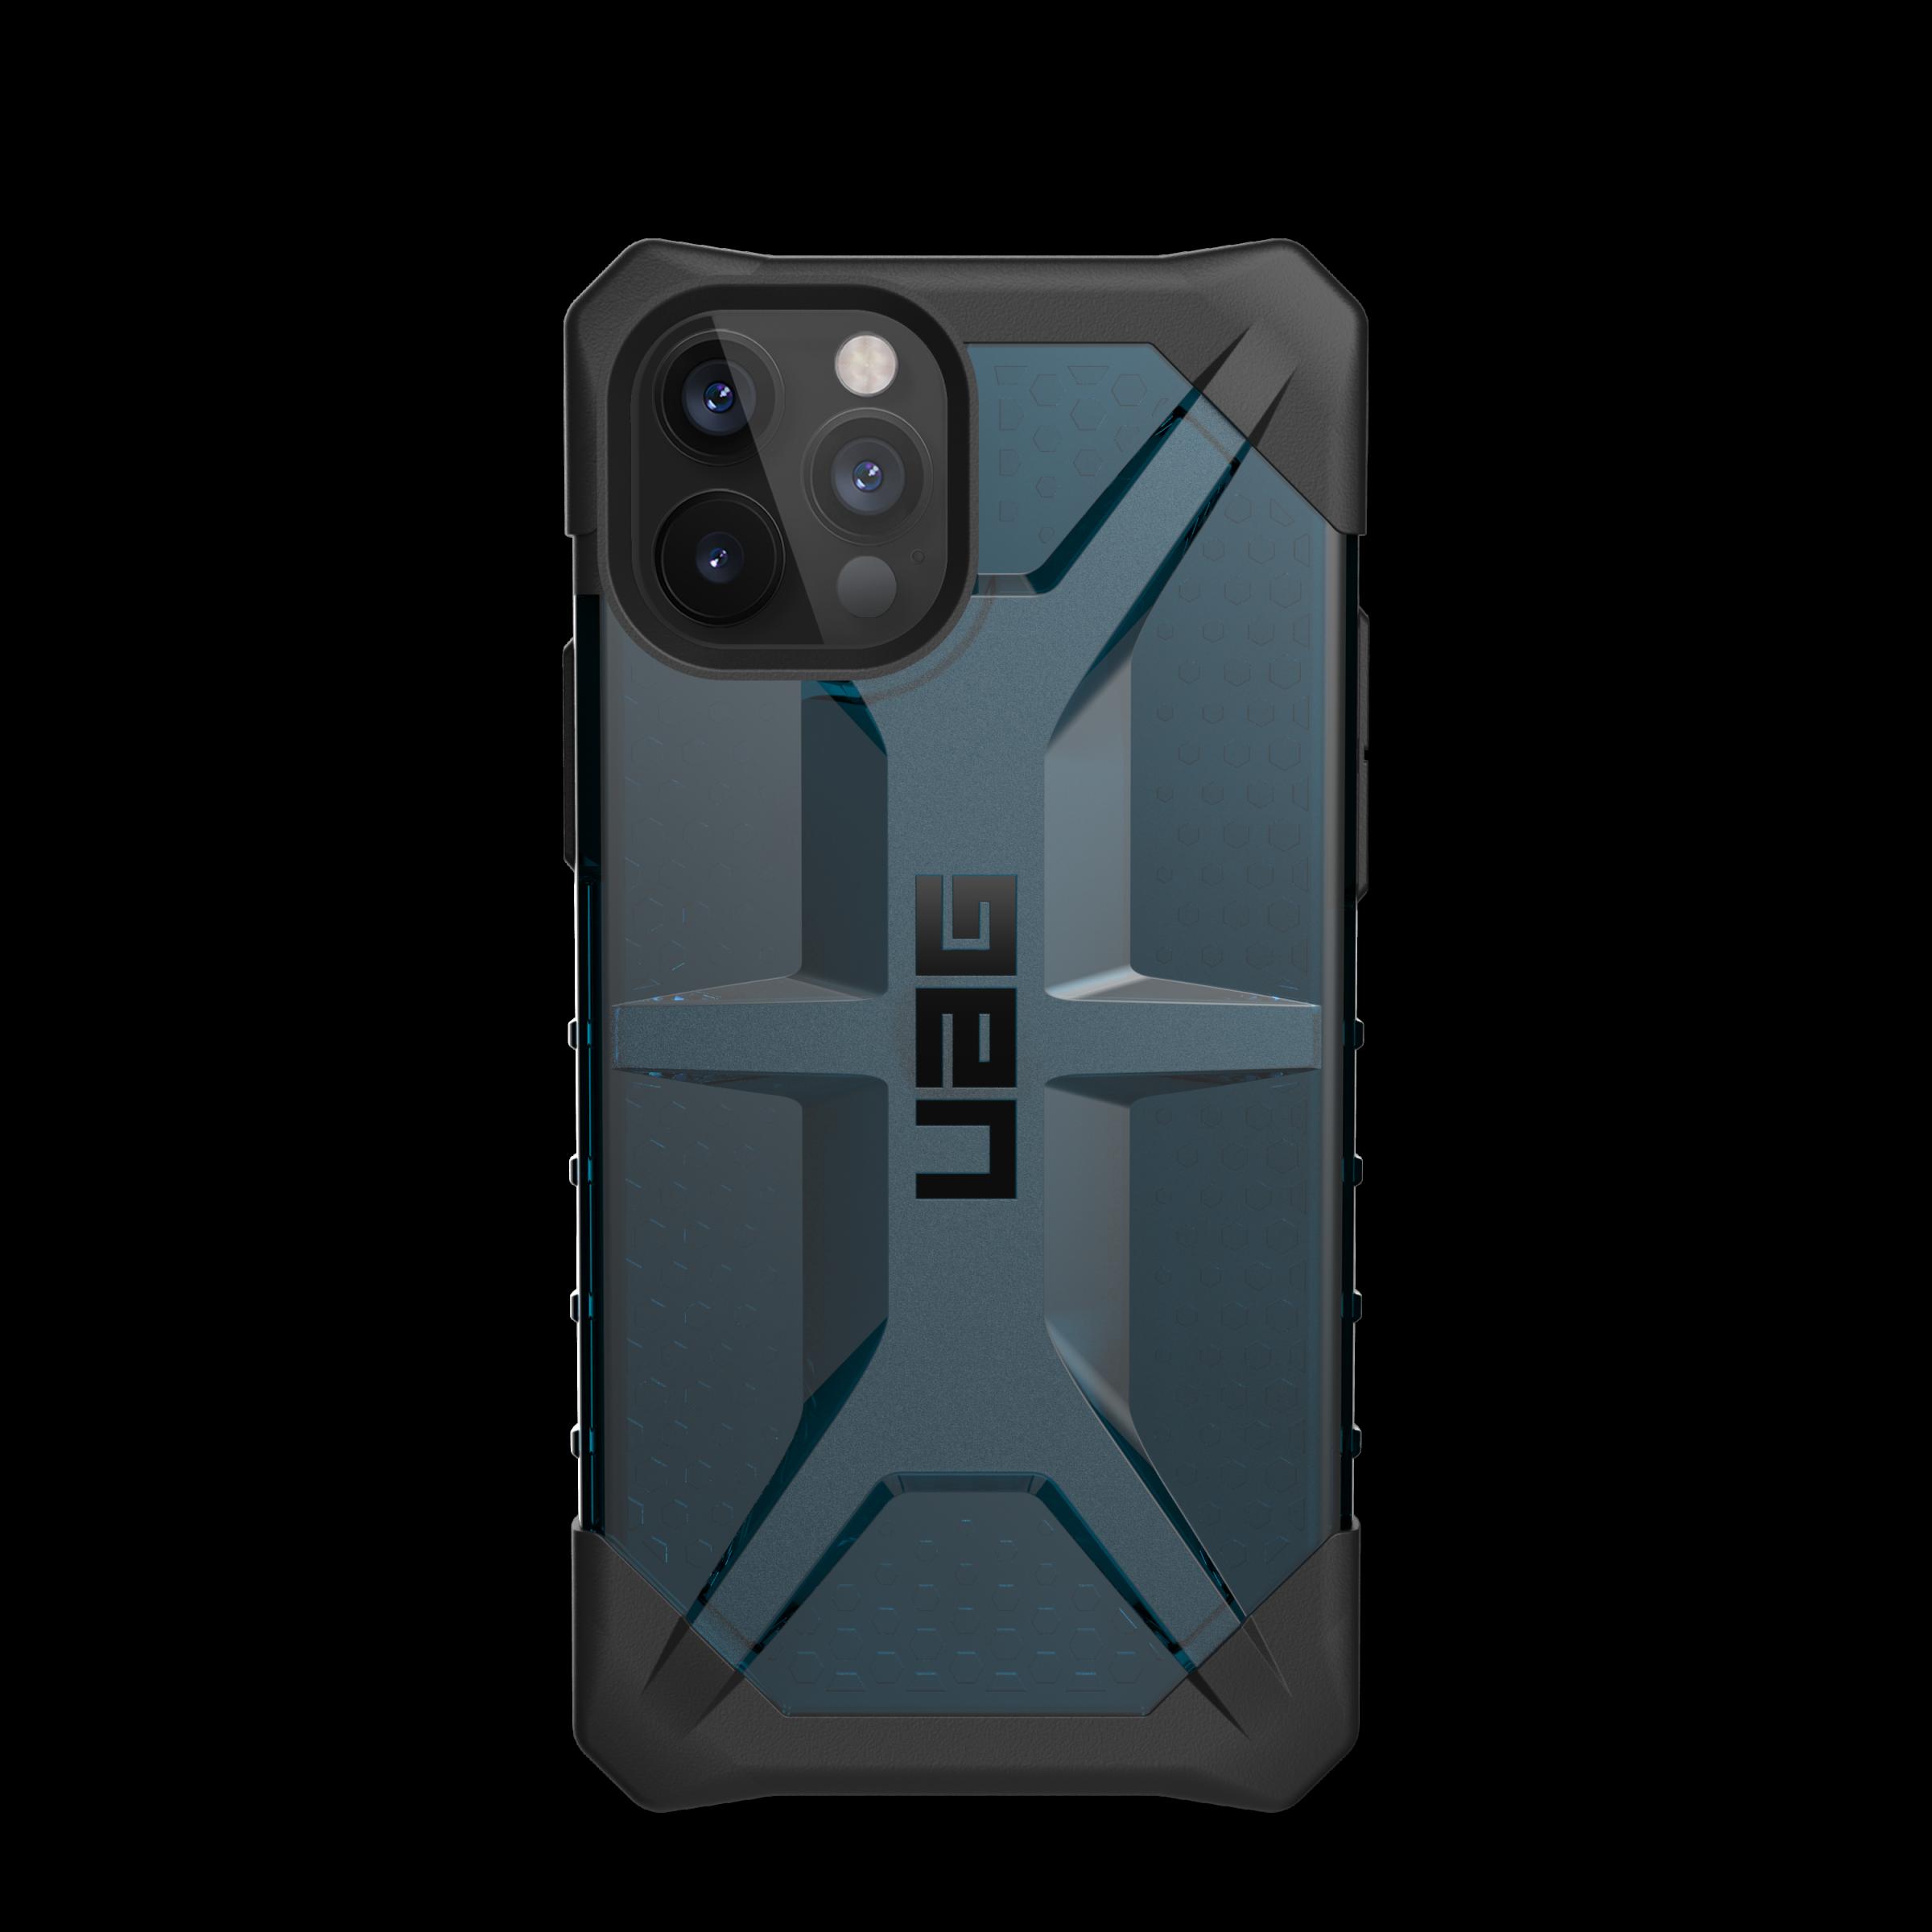 Plasma Series Case iPhone 12 Pro Max Mallard